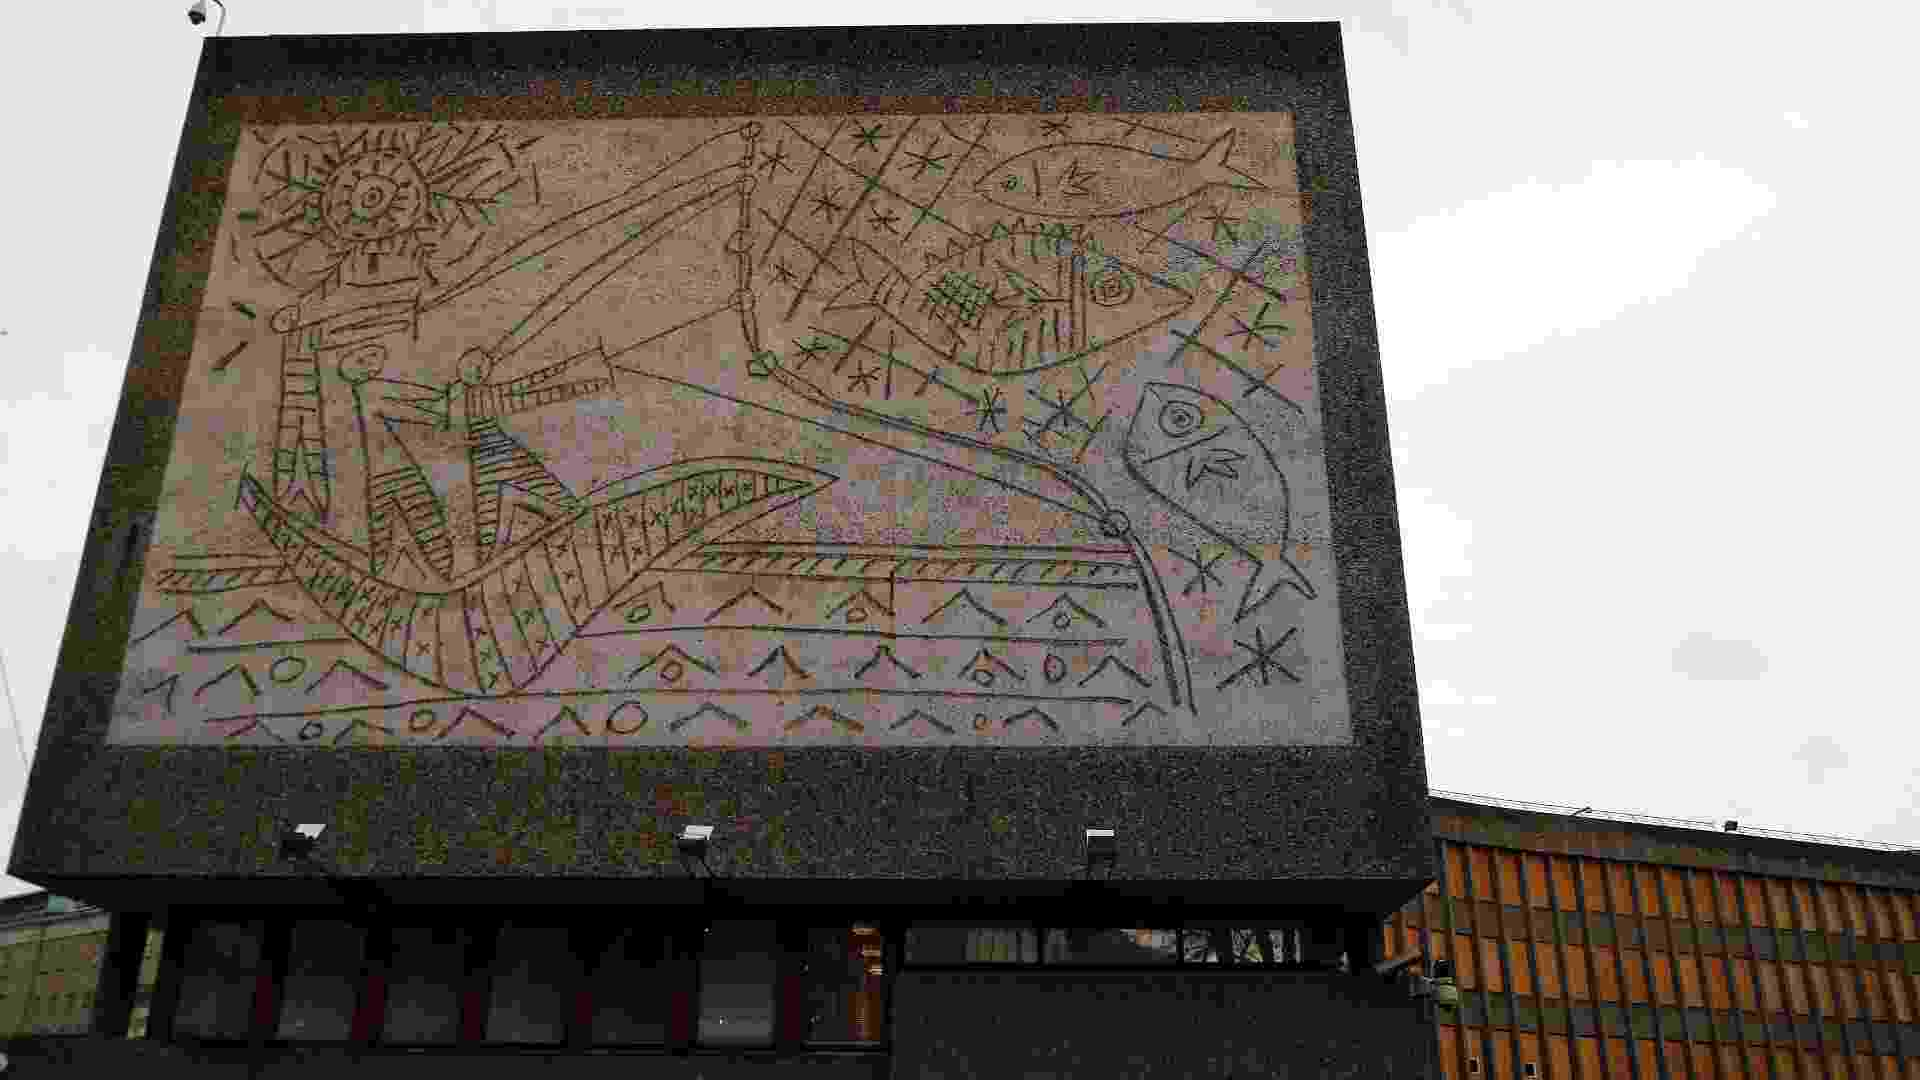 Fachada de edifício público de Oslo, na Noruega, com obra de Picasso -  Tobias Schwarz / Reuters